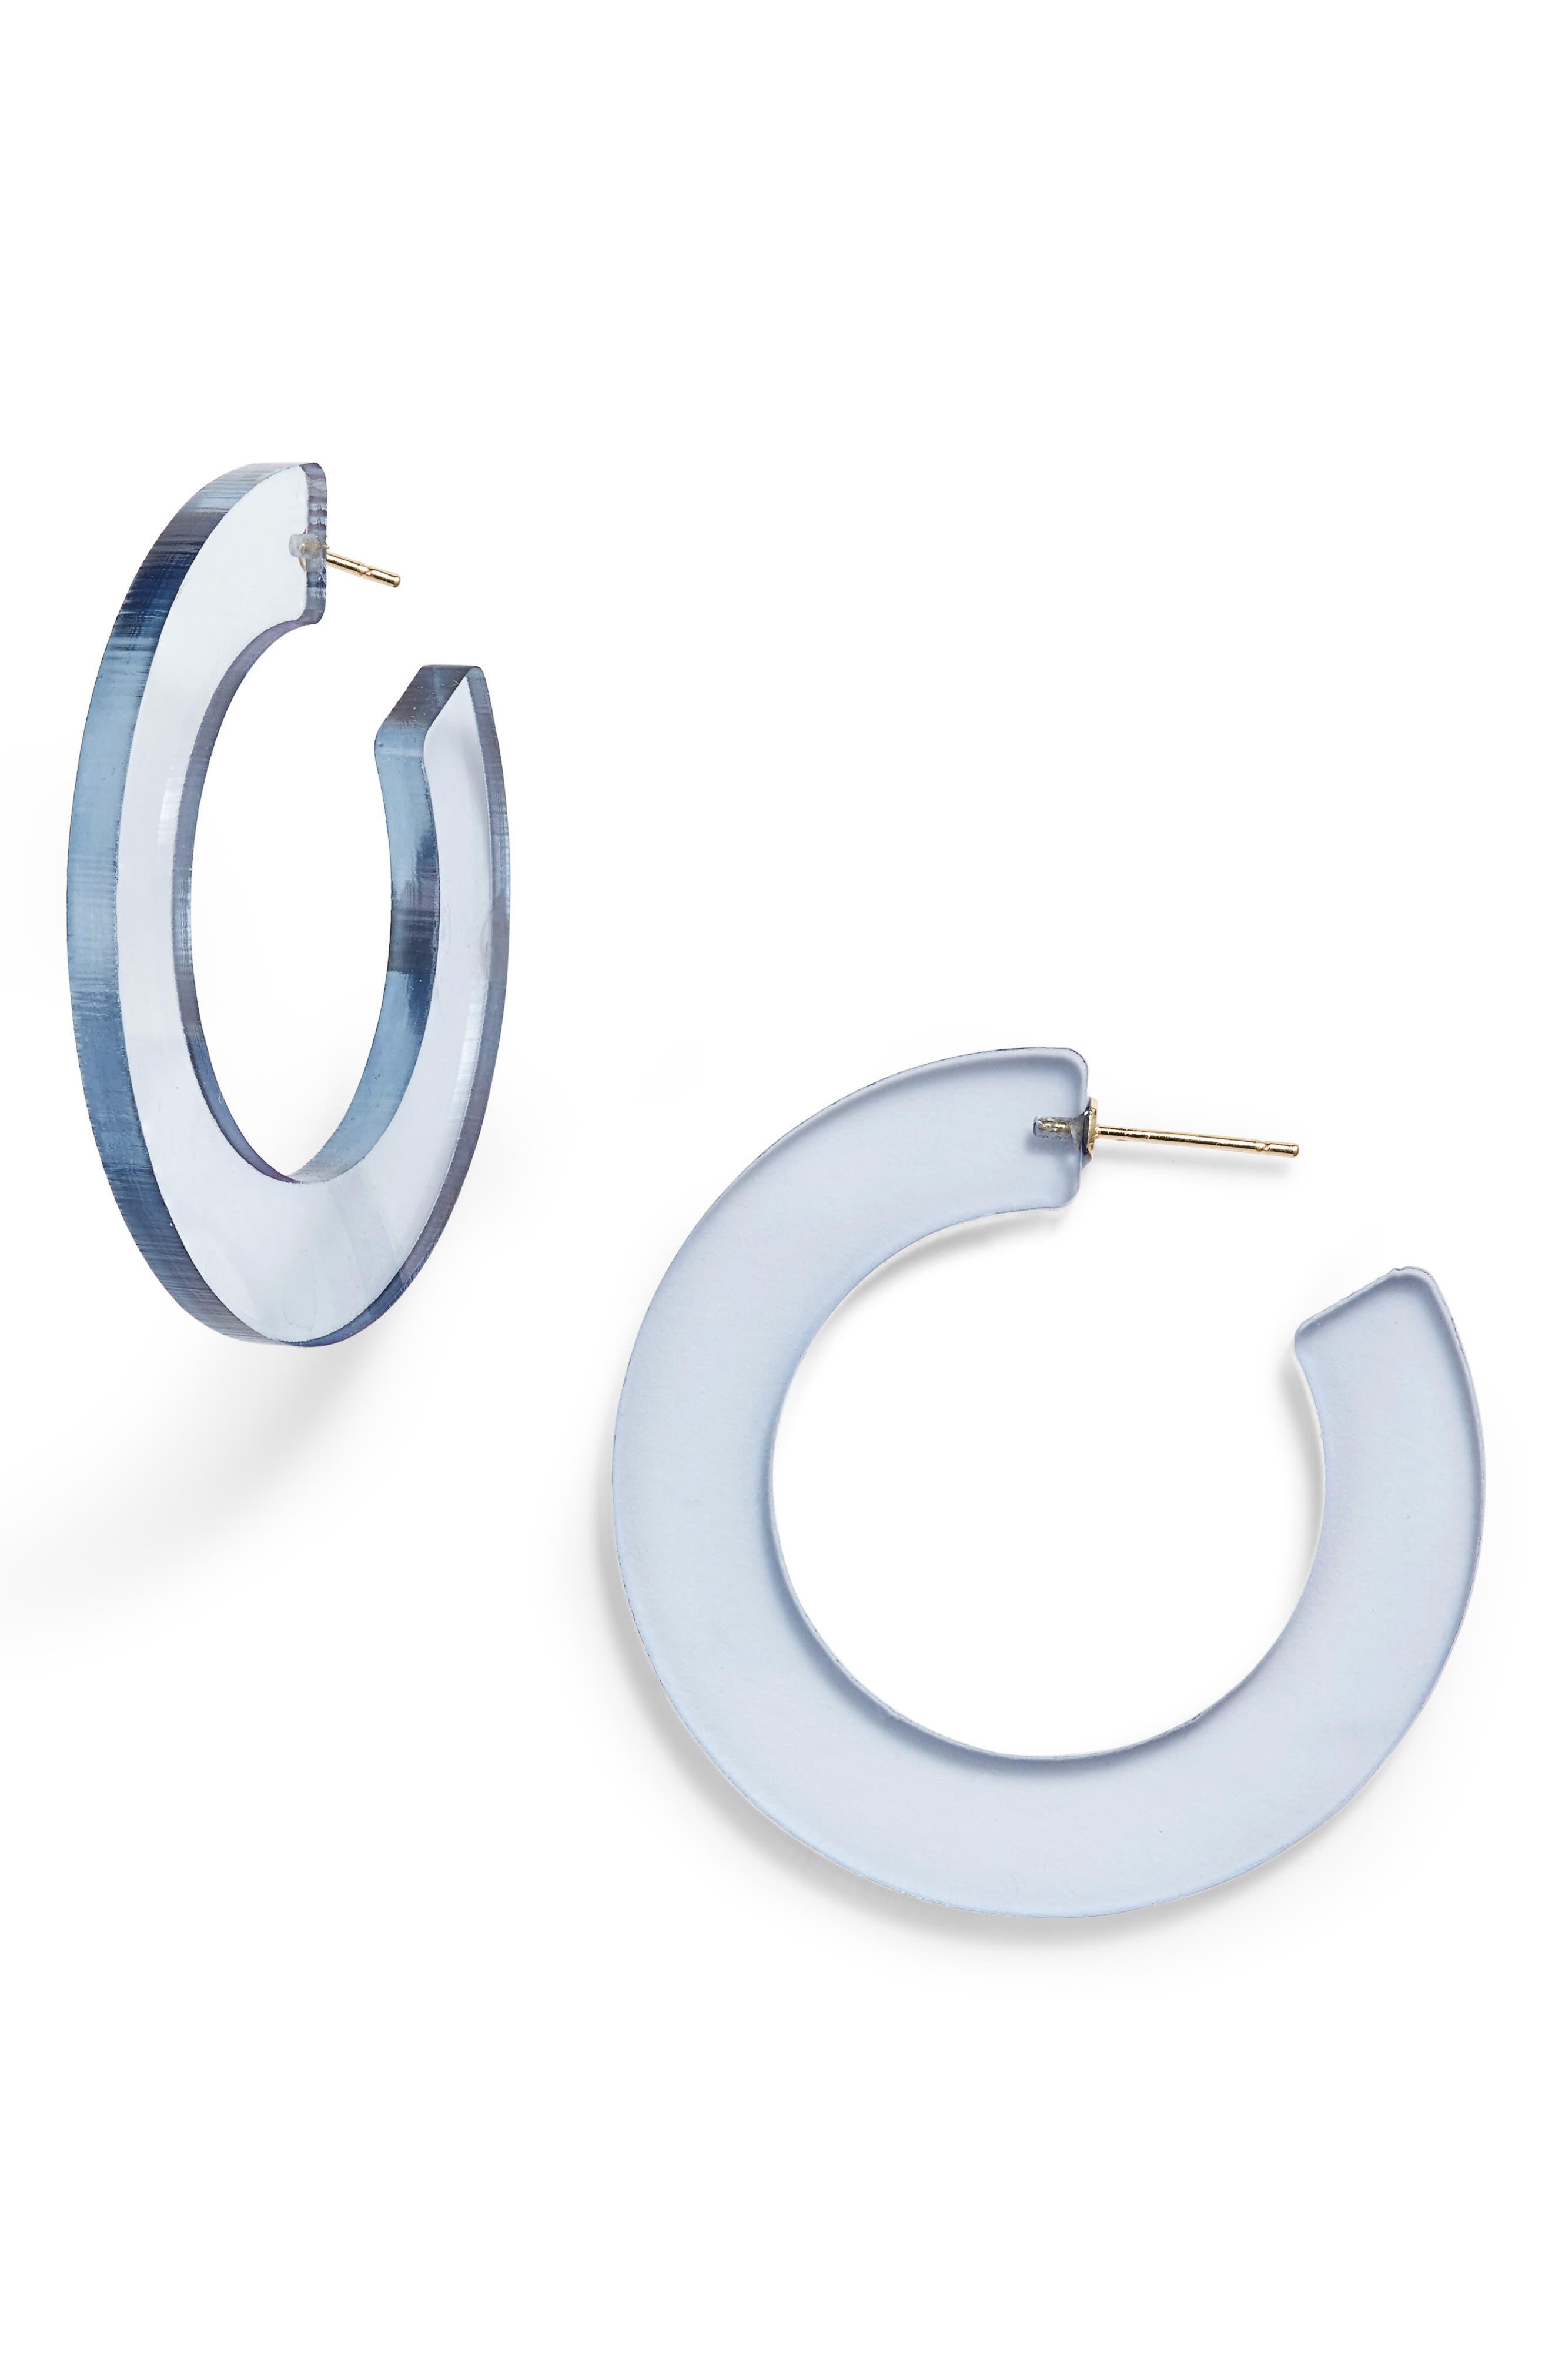 Acrylic Hoop Earrings,                             Main thumbnail 1, color,                             SMOKEY GREY